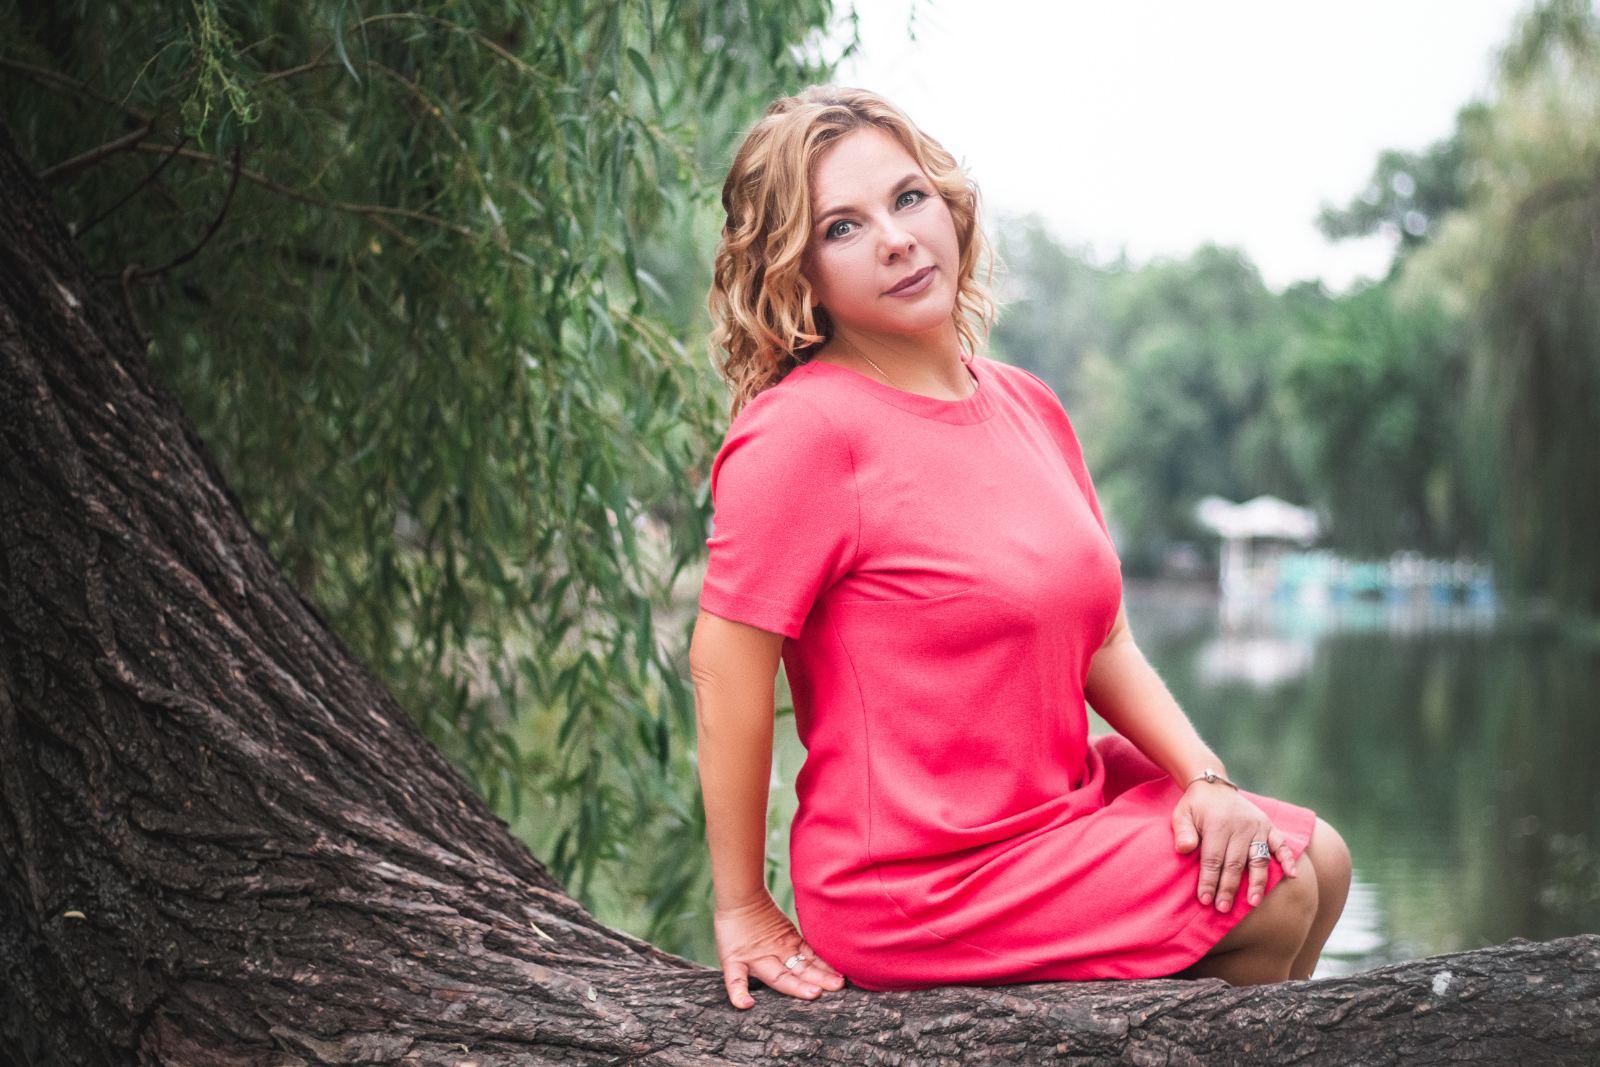 Olga, Im 42, from ucraina-zaporizzja - Marriage Agency Futura